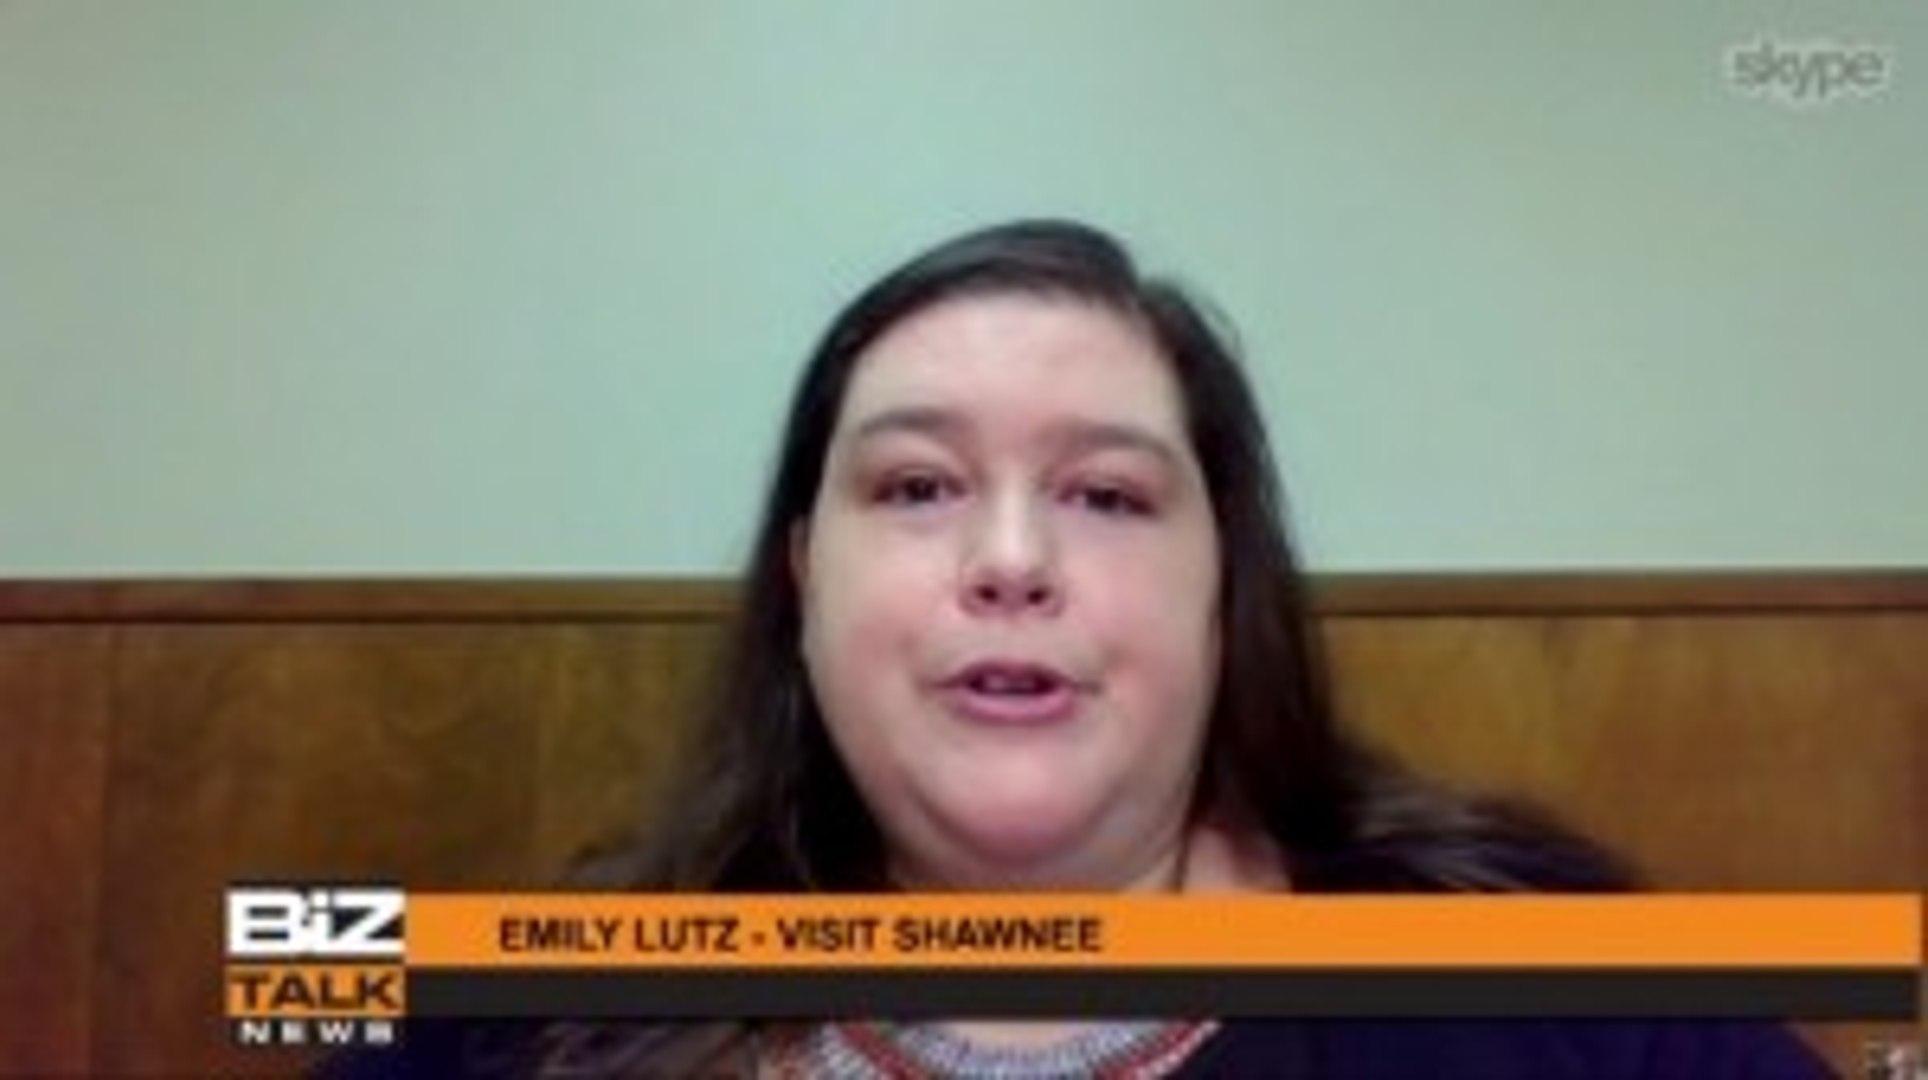 BizTalk Discovery: Visit Shawnee